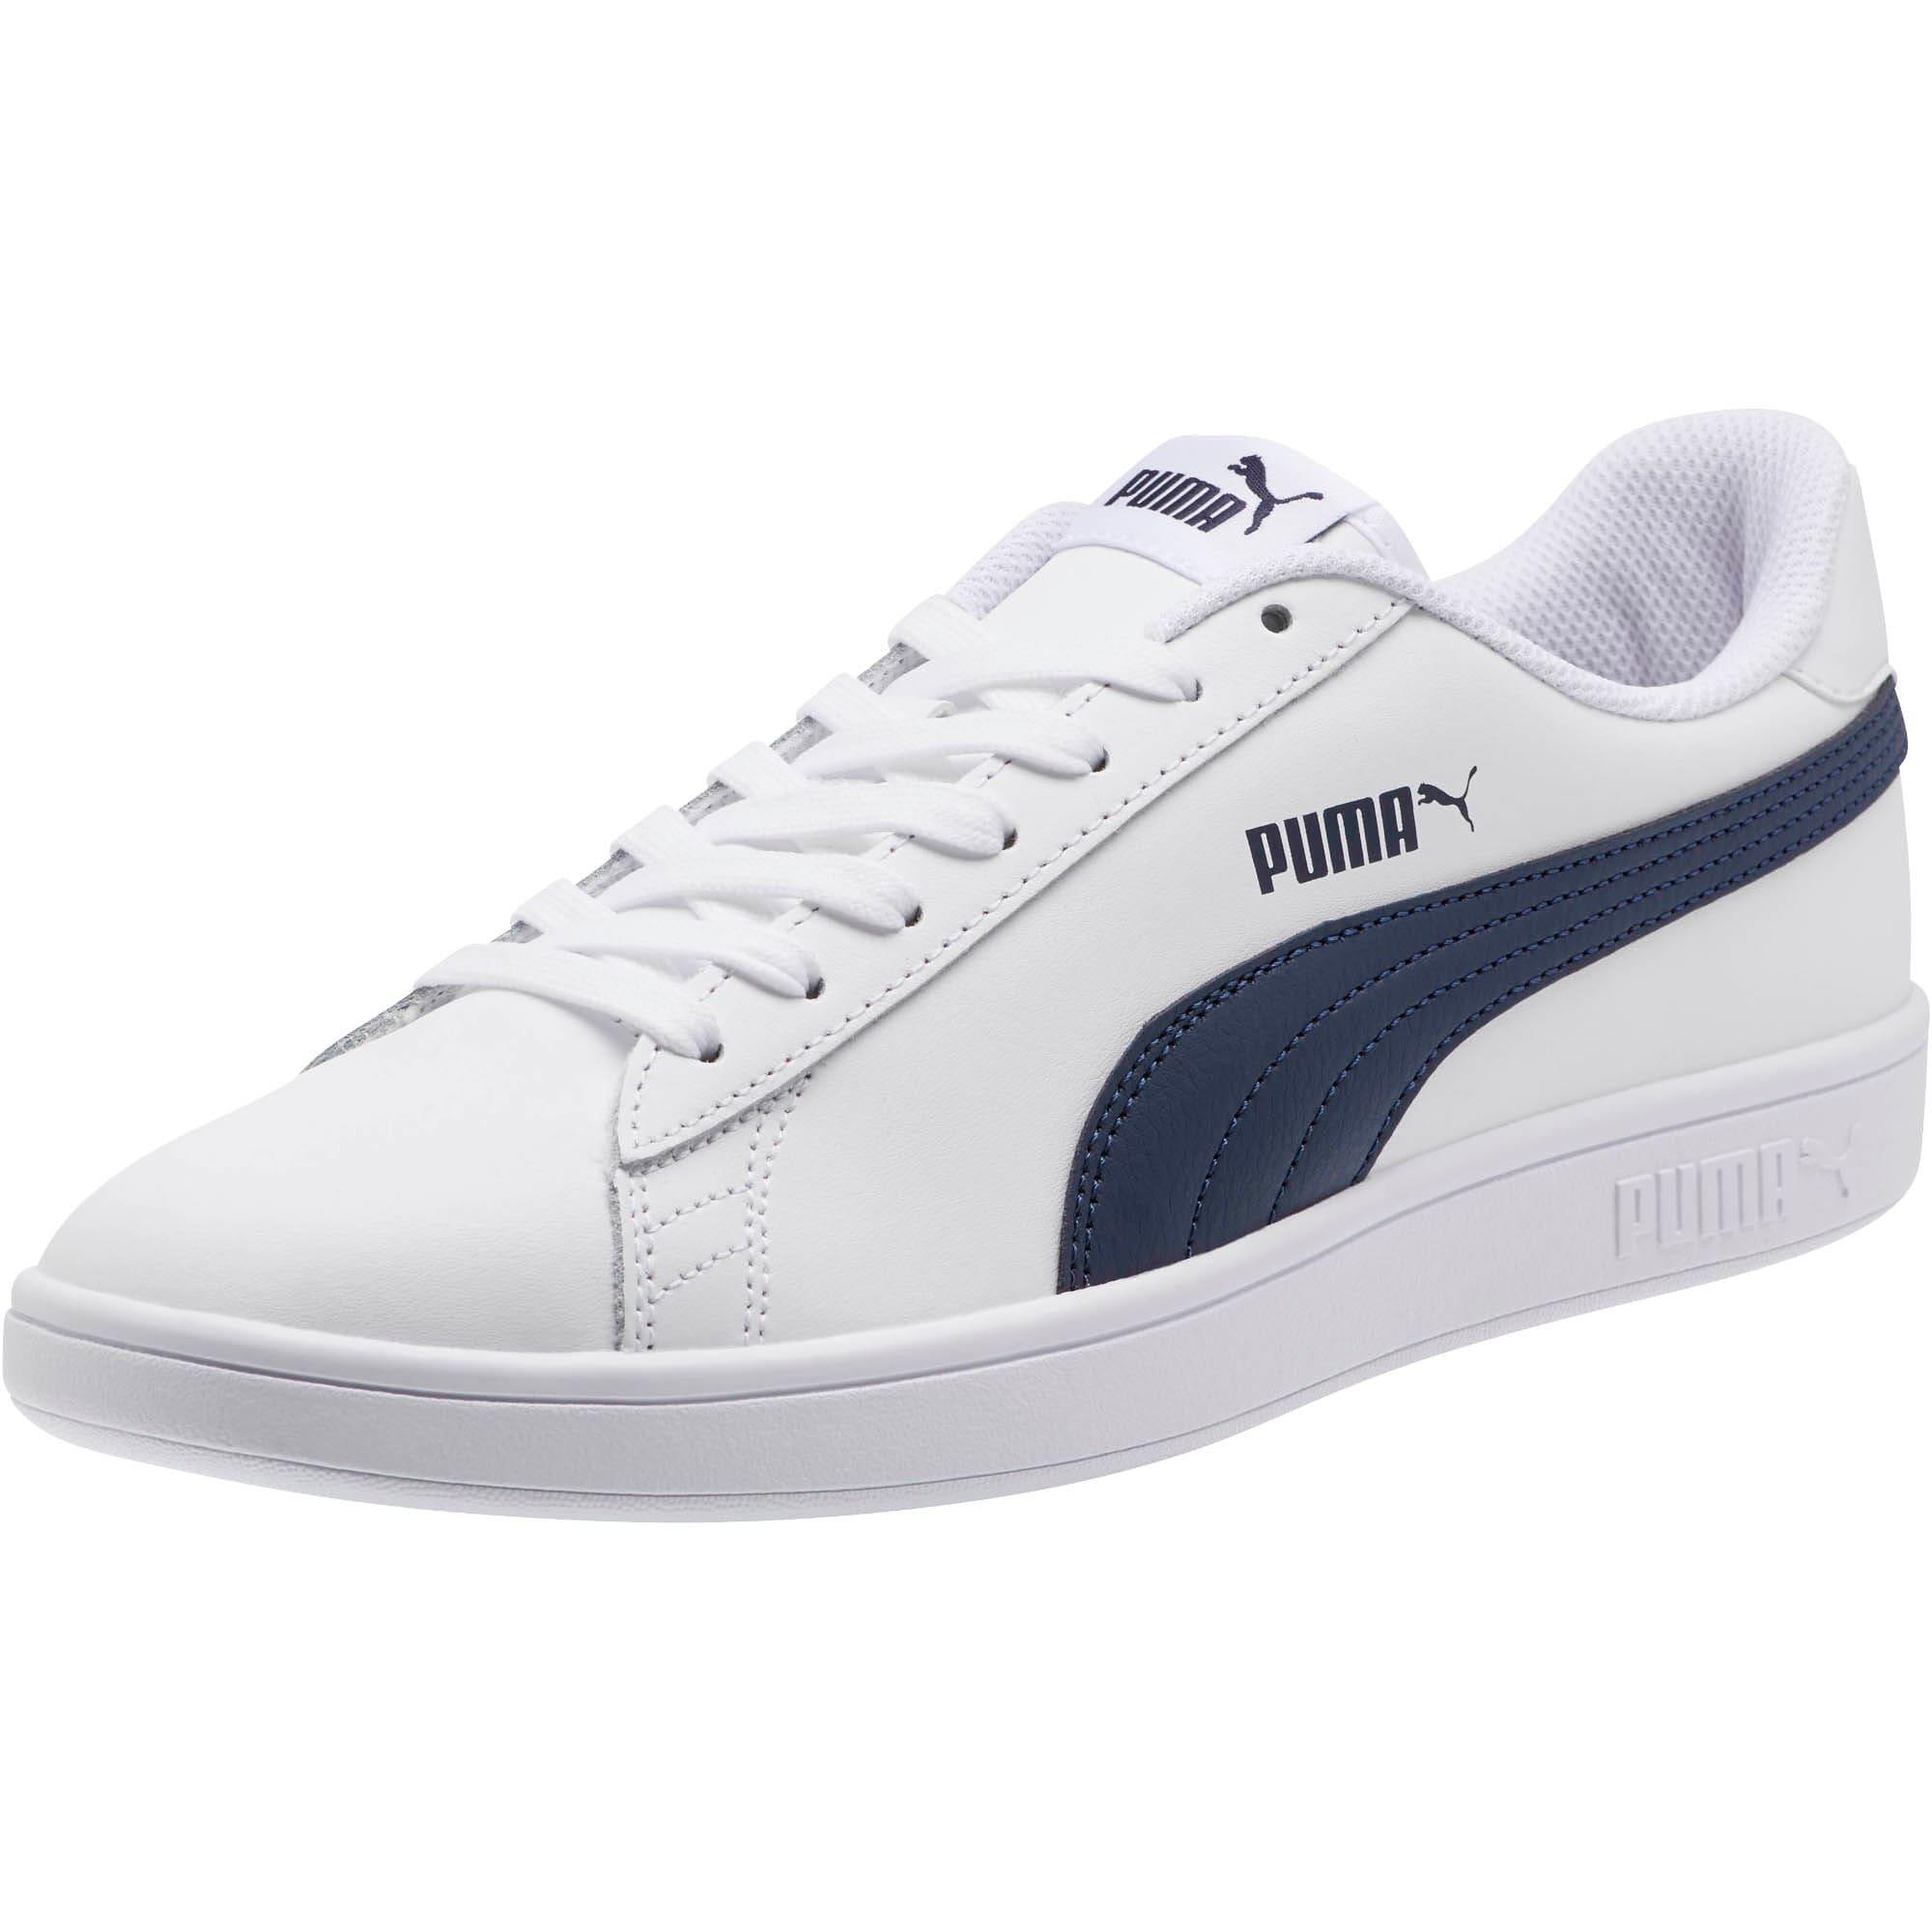 Thumbnail 1 of PUMA Smash v2 Sneakers, Puma White-Peacoat, medium